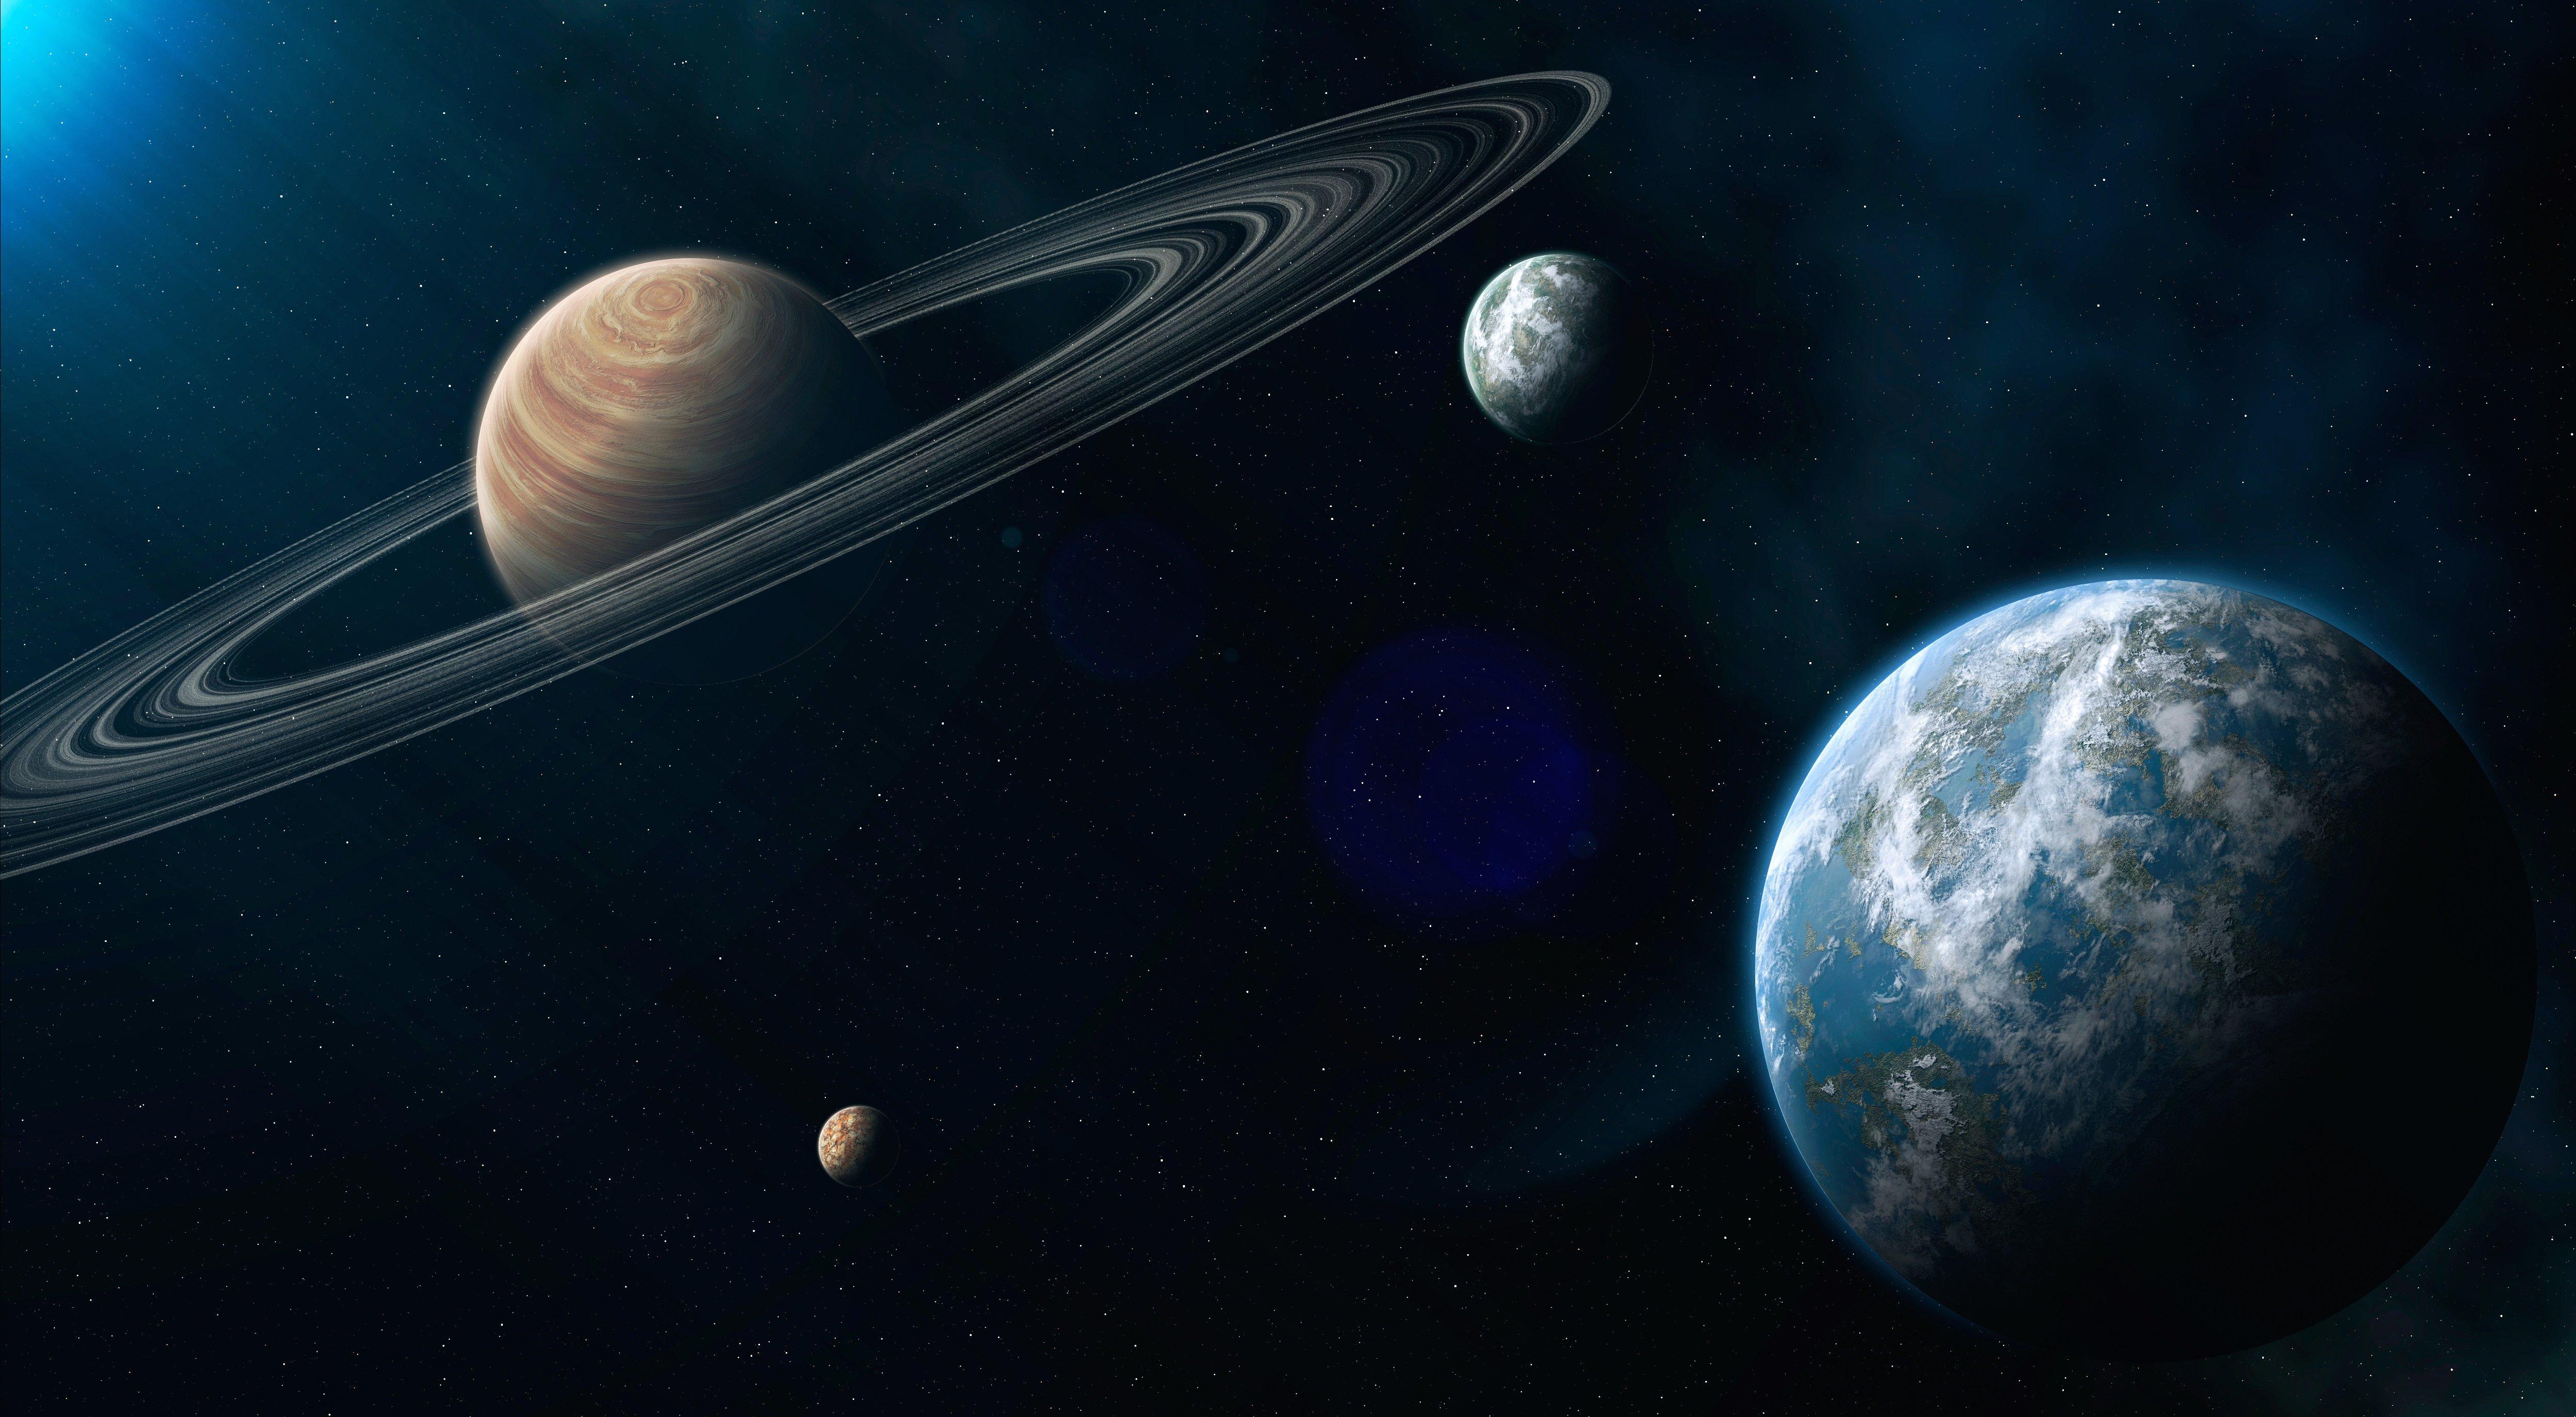 earth moon stars planets - photo #27